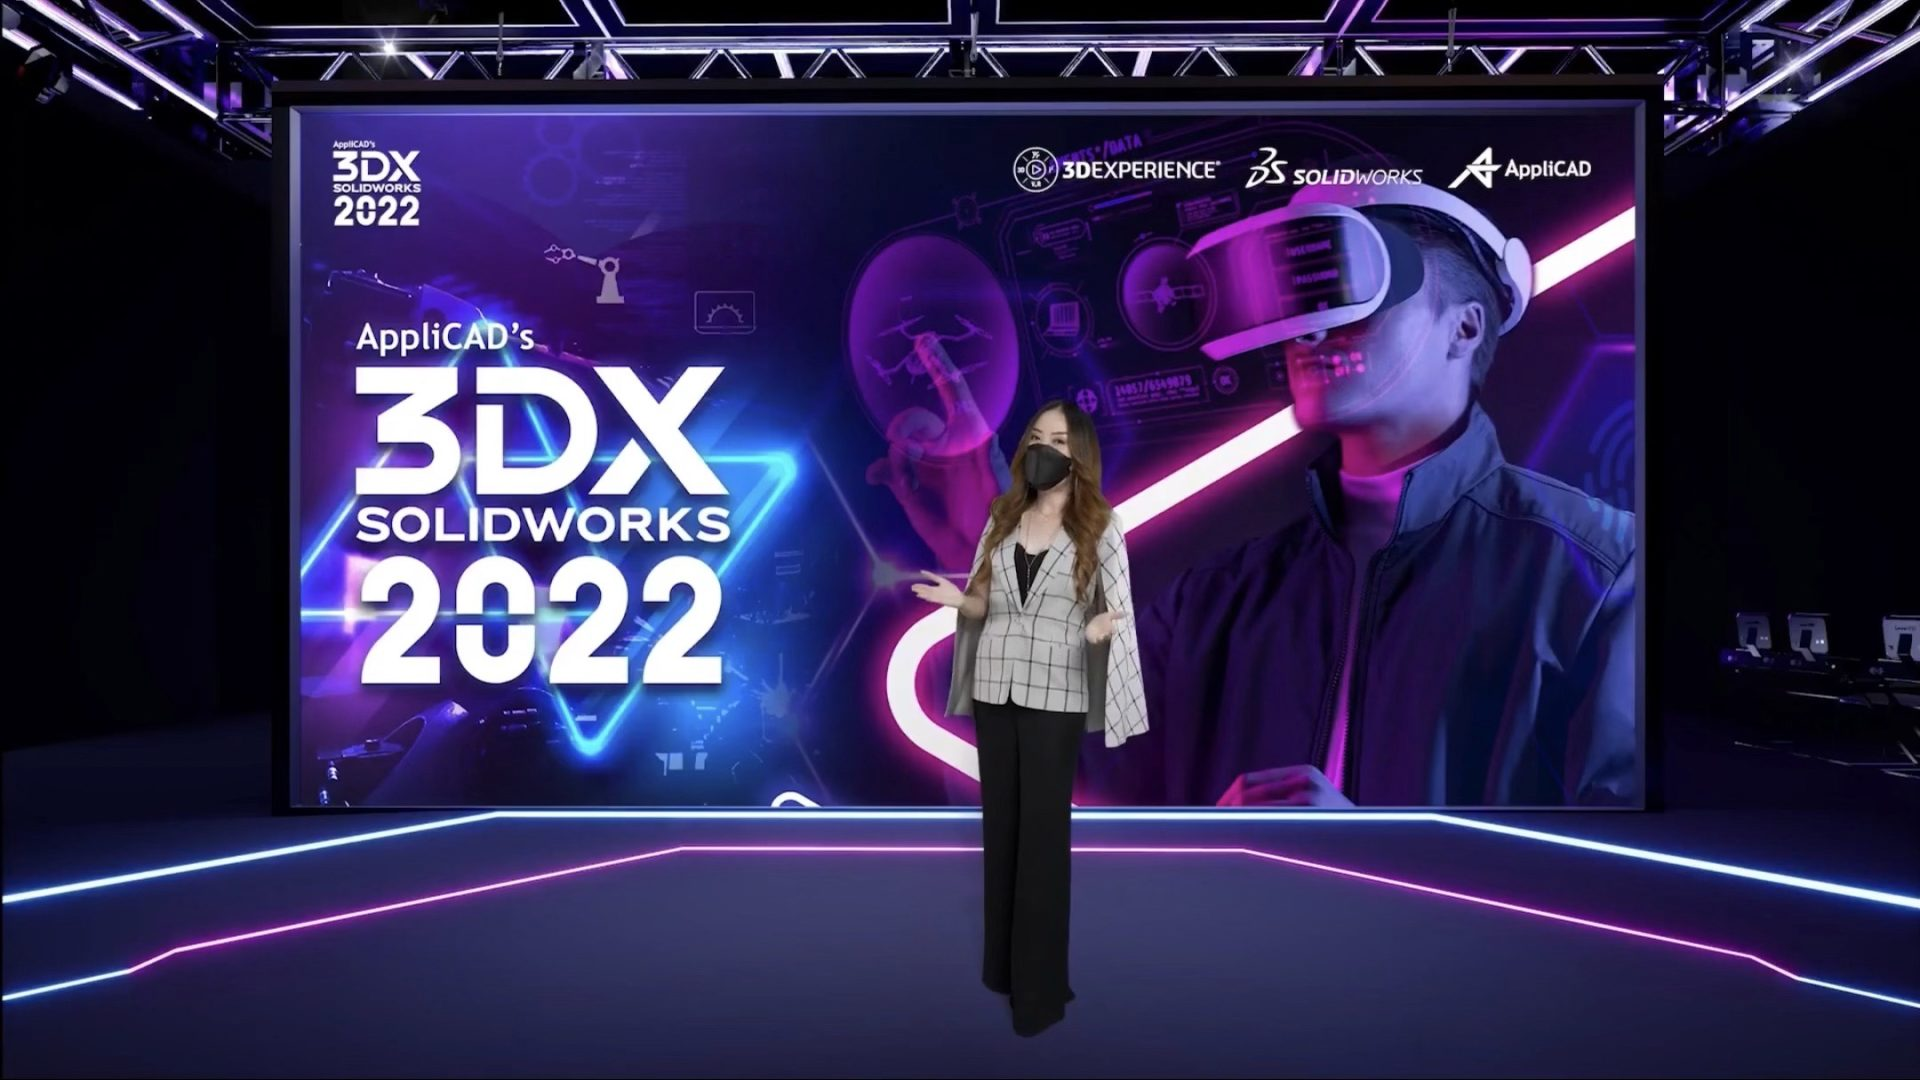 AppliCAD's 3DExperience SOLIDWORKS ในรูปแบบออนไลน์ Virtual Event